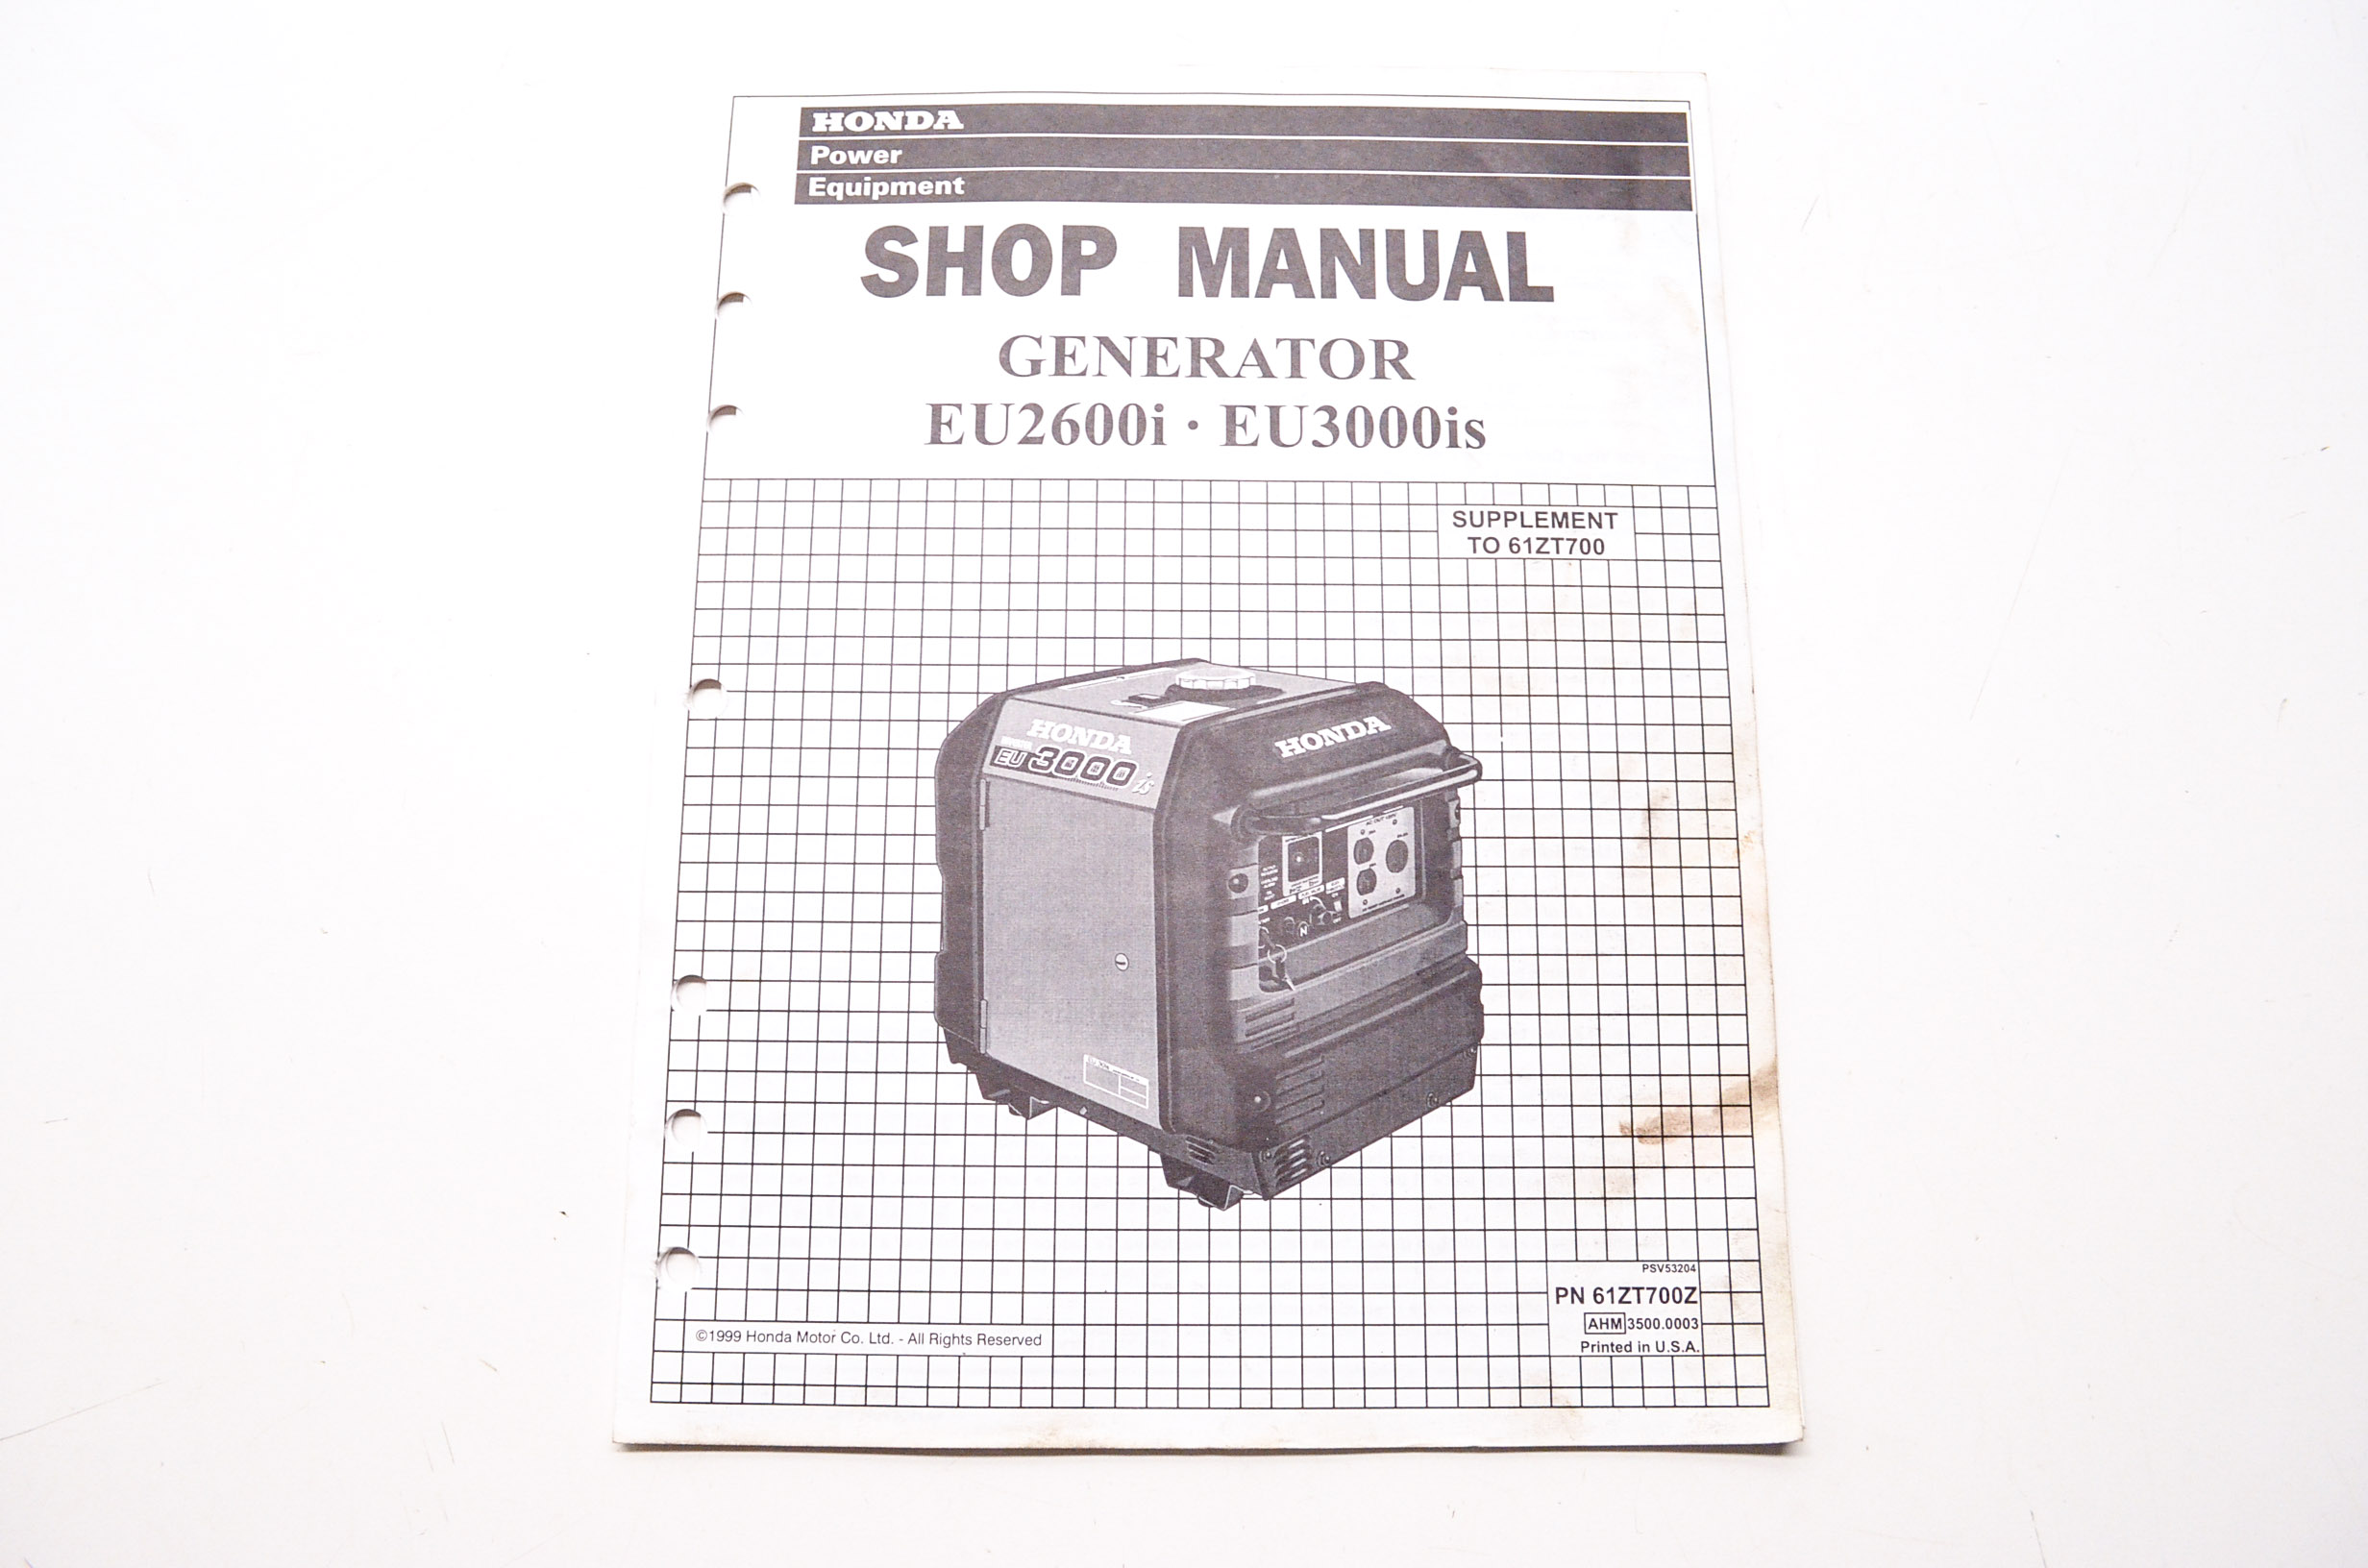 Power Equipment Service Shop Manual Generator Supplement